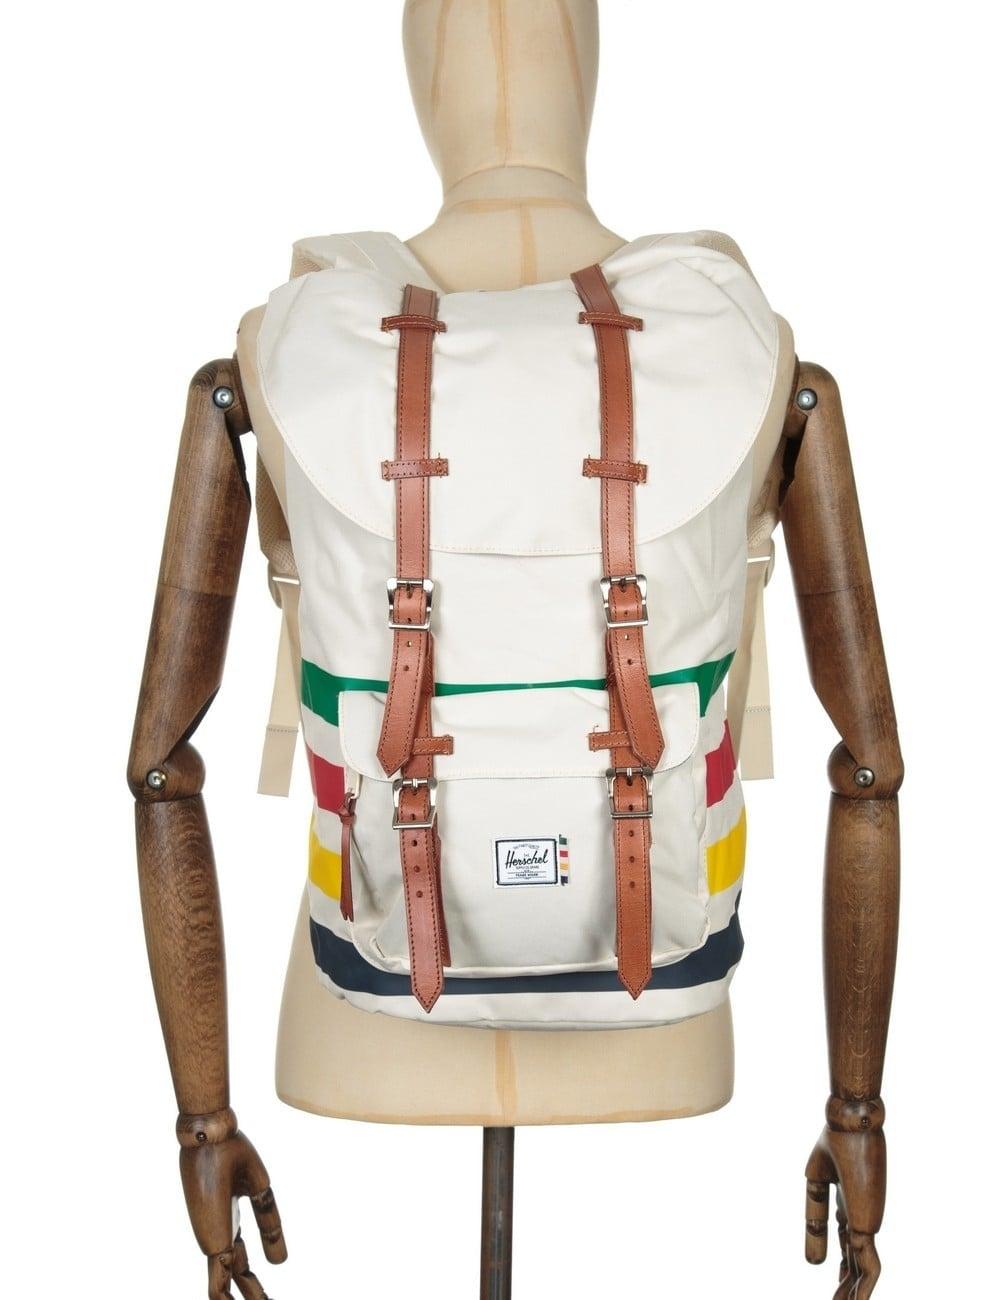 1150366cac8 Herschel Supply Co Little America 25L Backpack - Hudson Bay Co ...